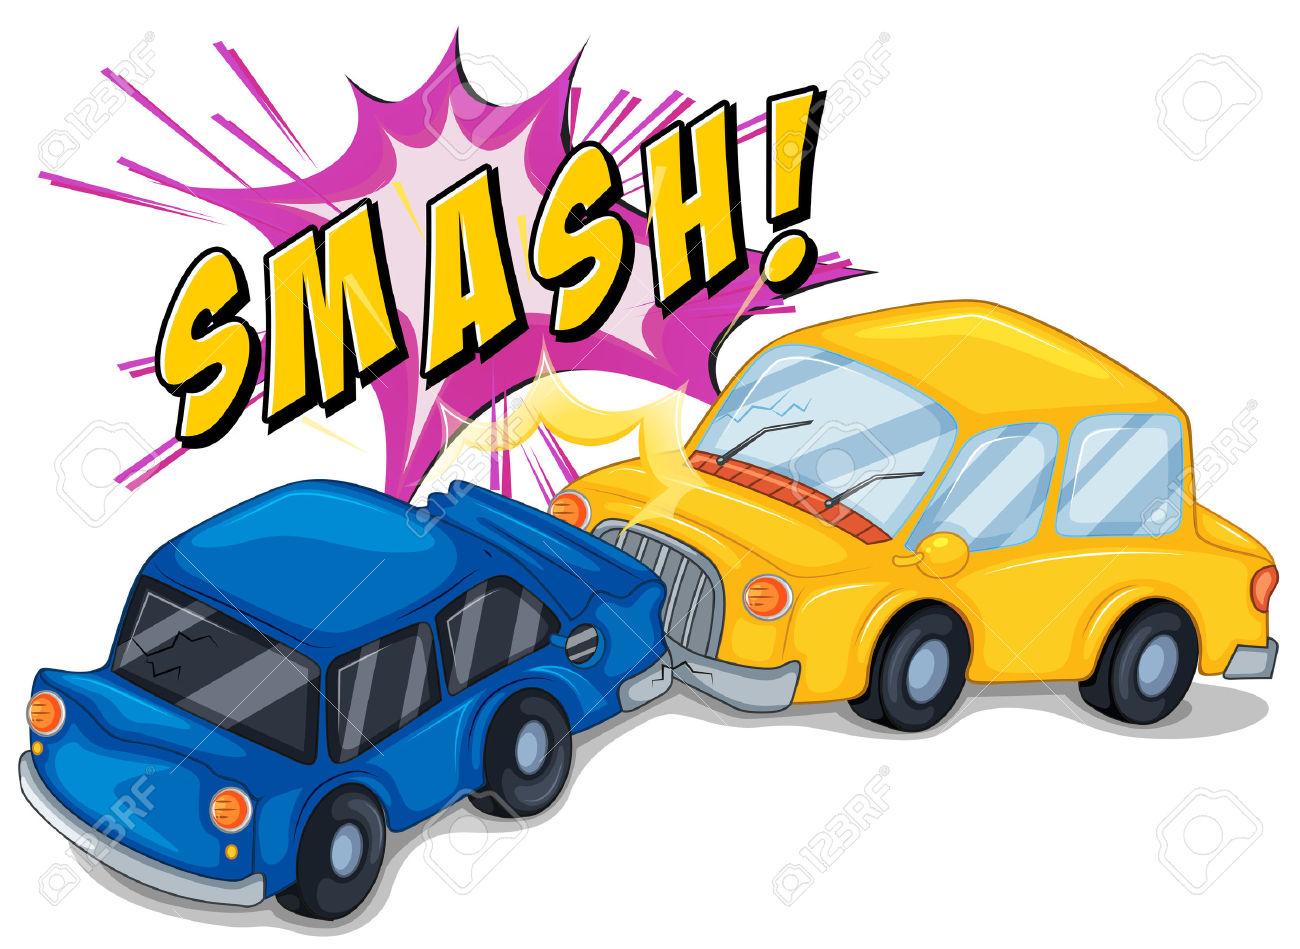 Bus car crash clipart graphic transparent stock Accident Cartoon Clipart | Free download best Accident Cartoon ... graphic transparent stock